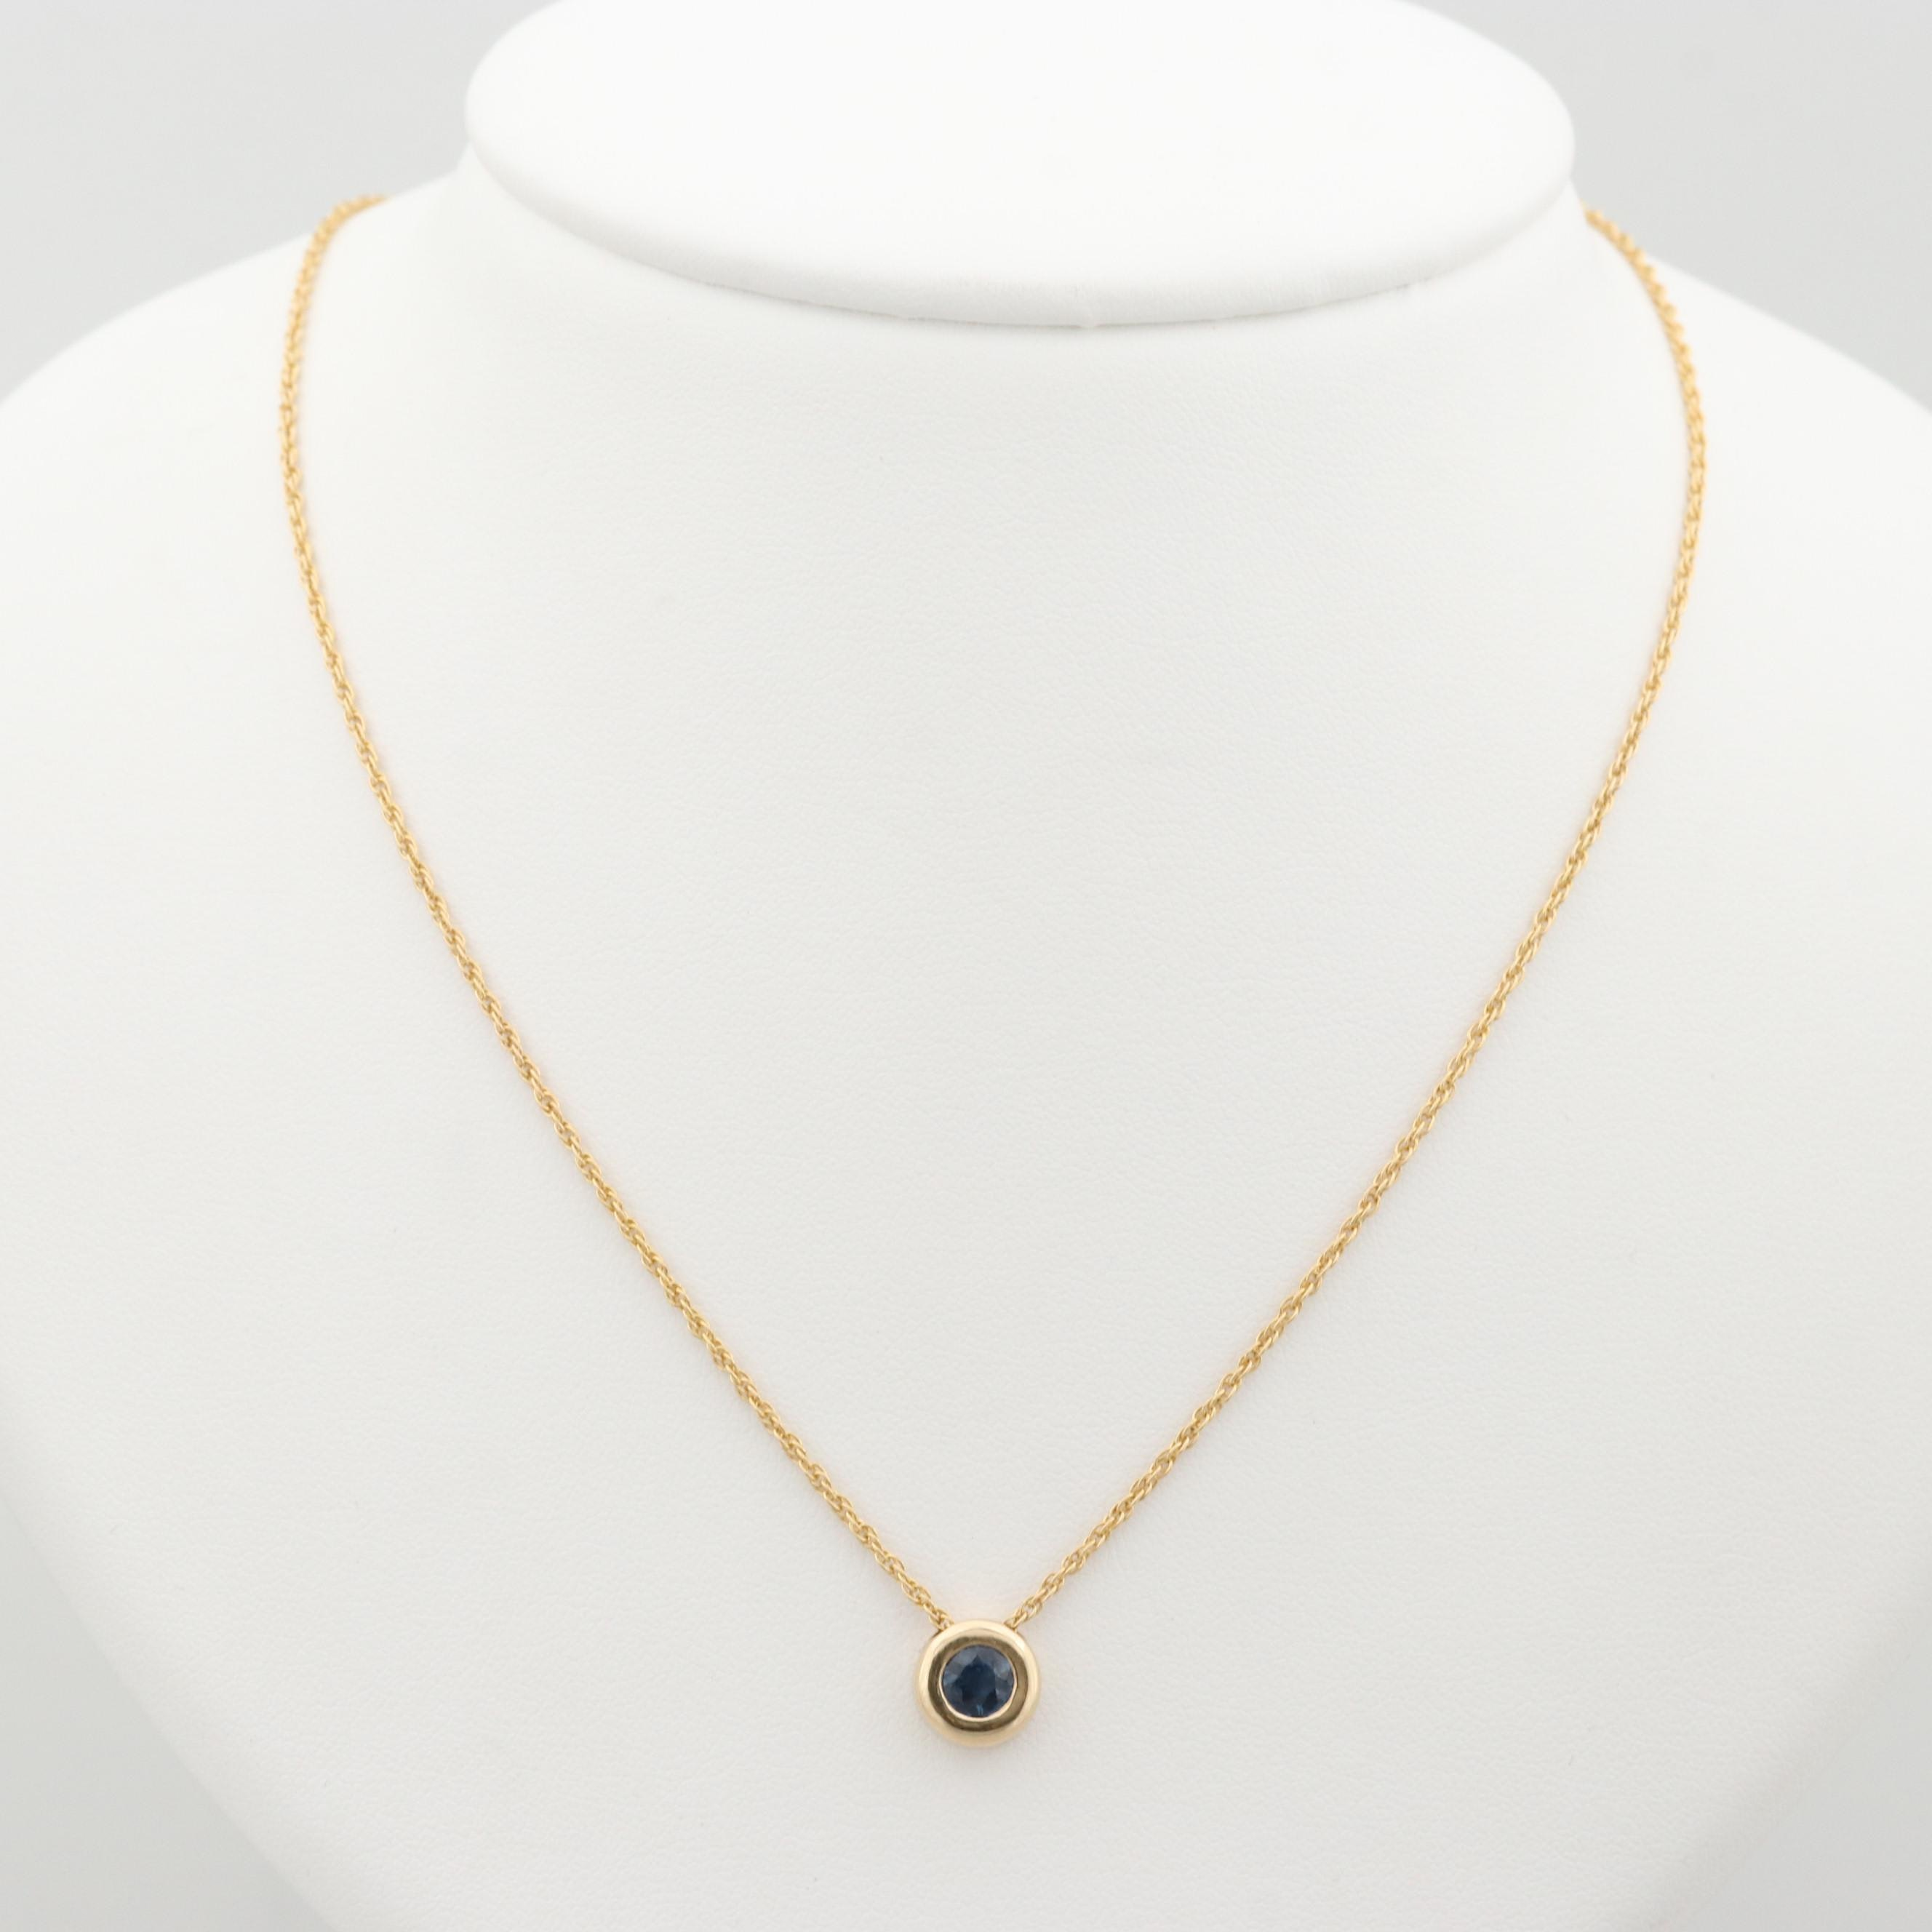 14K Yellow Gold Sapphire Pendant Necklace